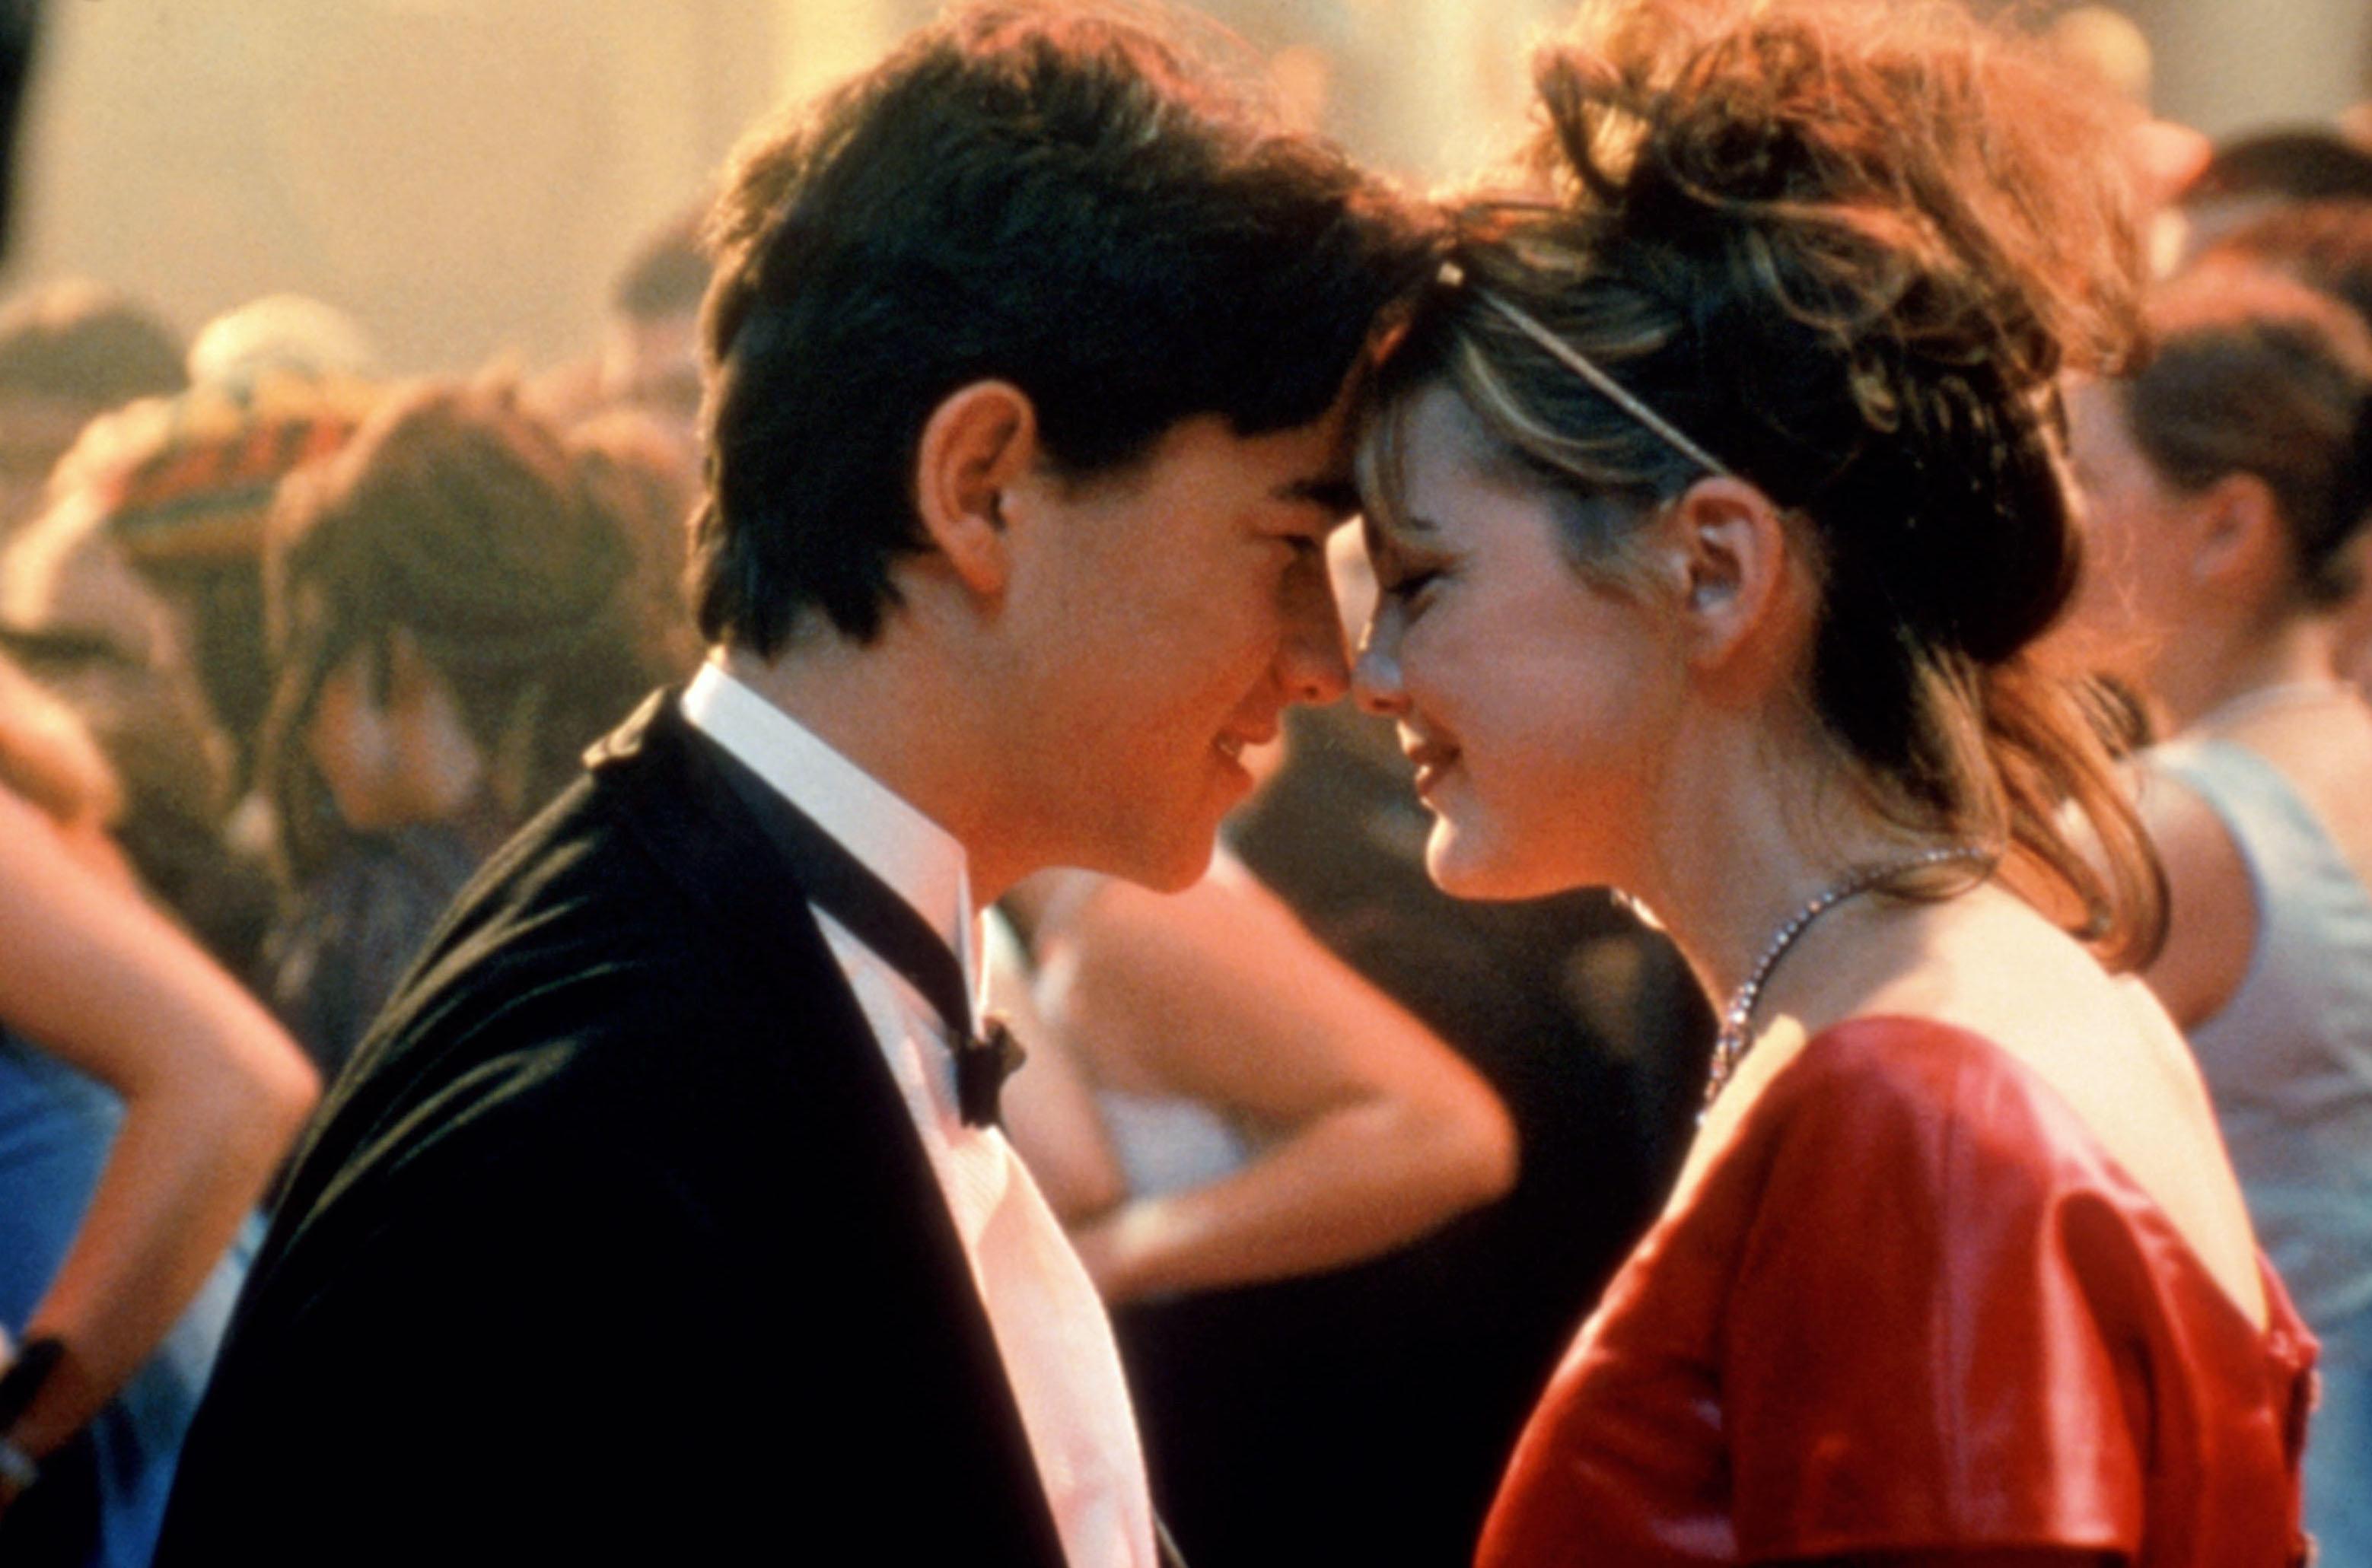 10 Things I Hate About You Movie Poster: Spotlight On: Joseph Gordon-Levitt